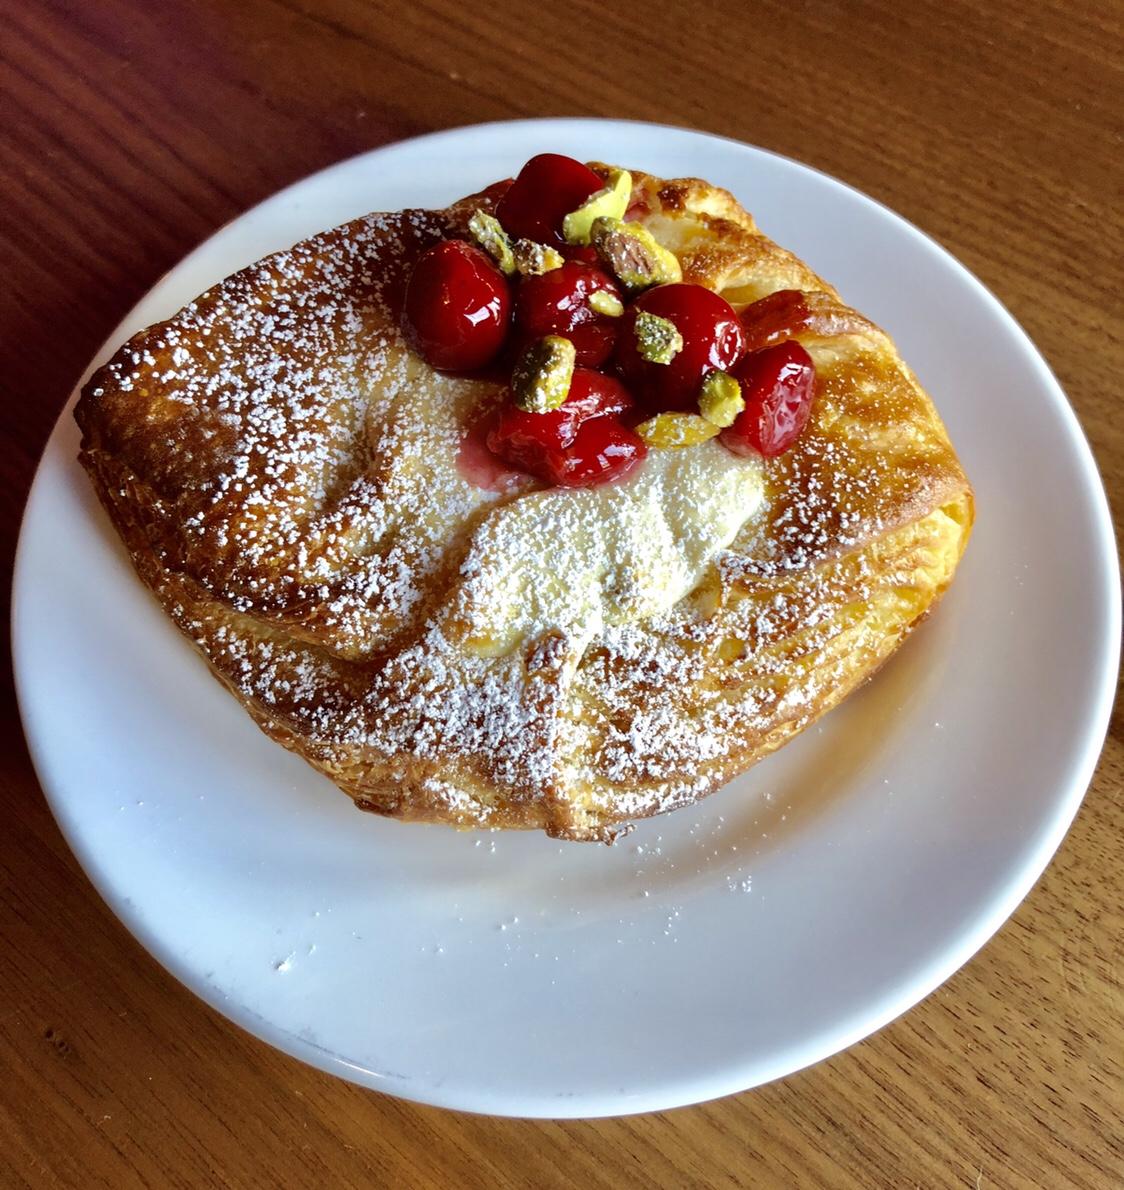 Pastry from Rowhouse Bakery #rowhousebakery #buffalo #buffalony #buffalobakery #buffalofood